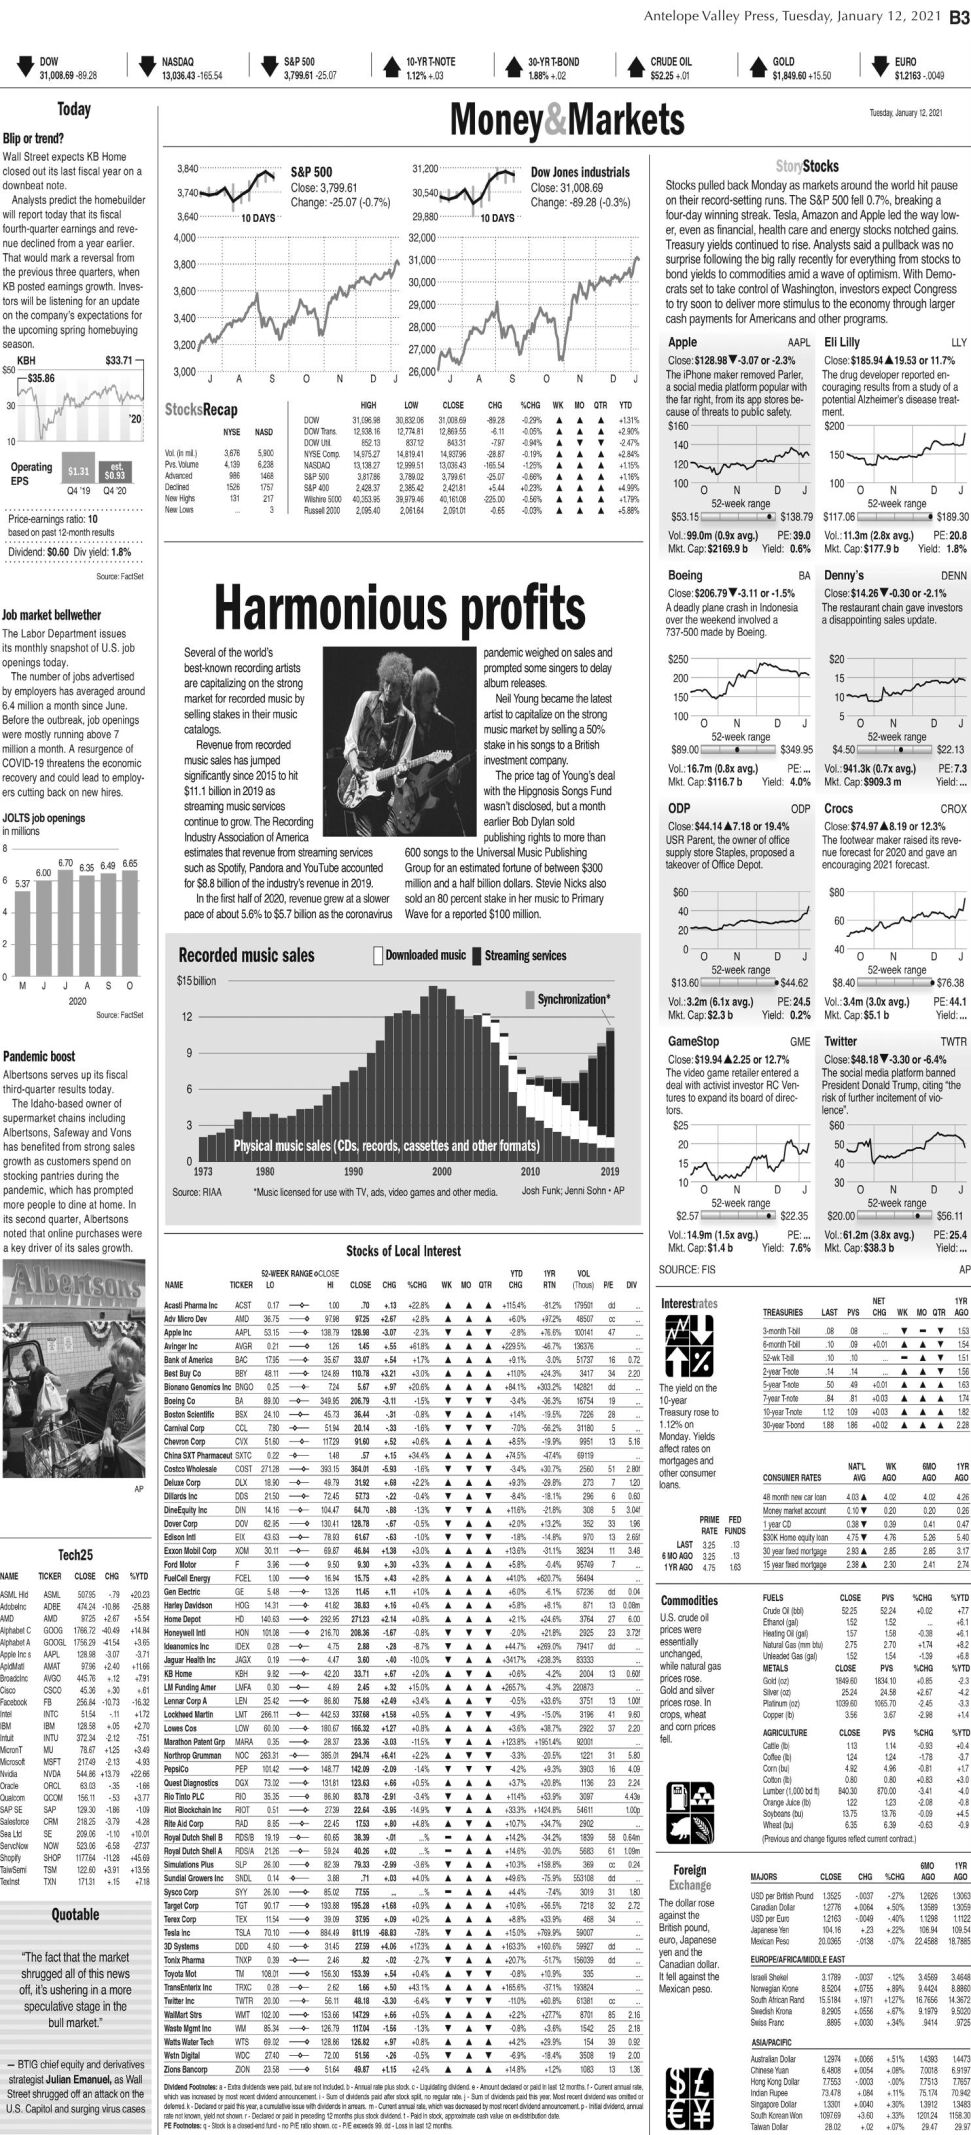 Money & Markets, Jan. 12, 2021